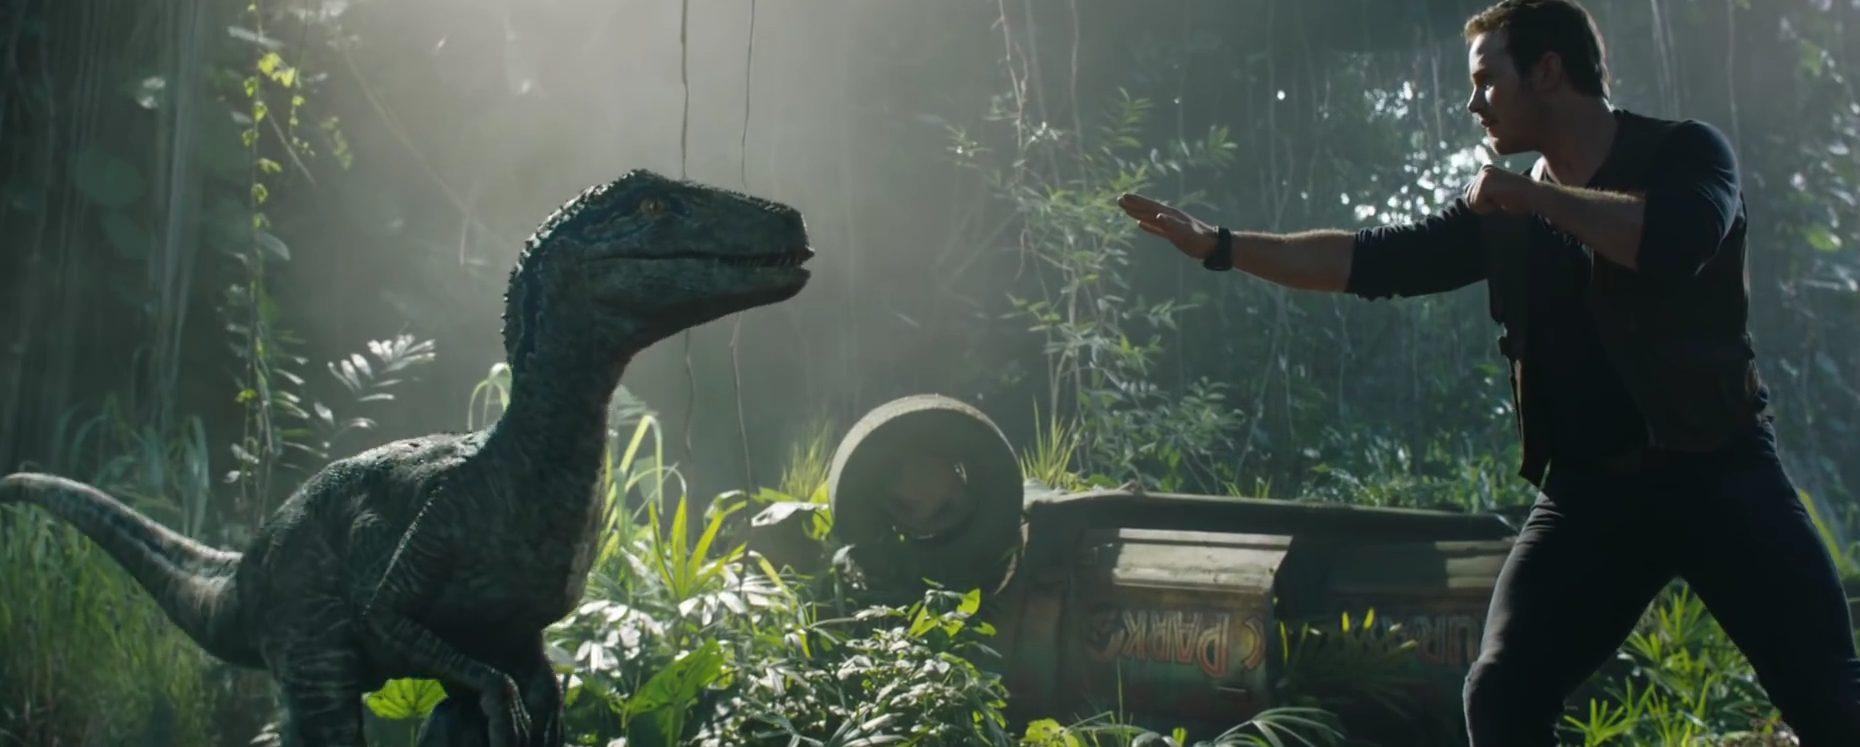 https://cinemaplanet.pt/wp-content/uploads/2017/12/Jurassic-world-fallen-kingdom.jpg